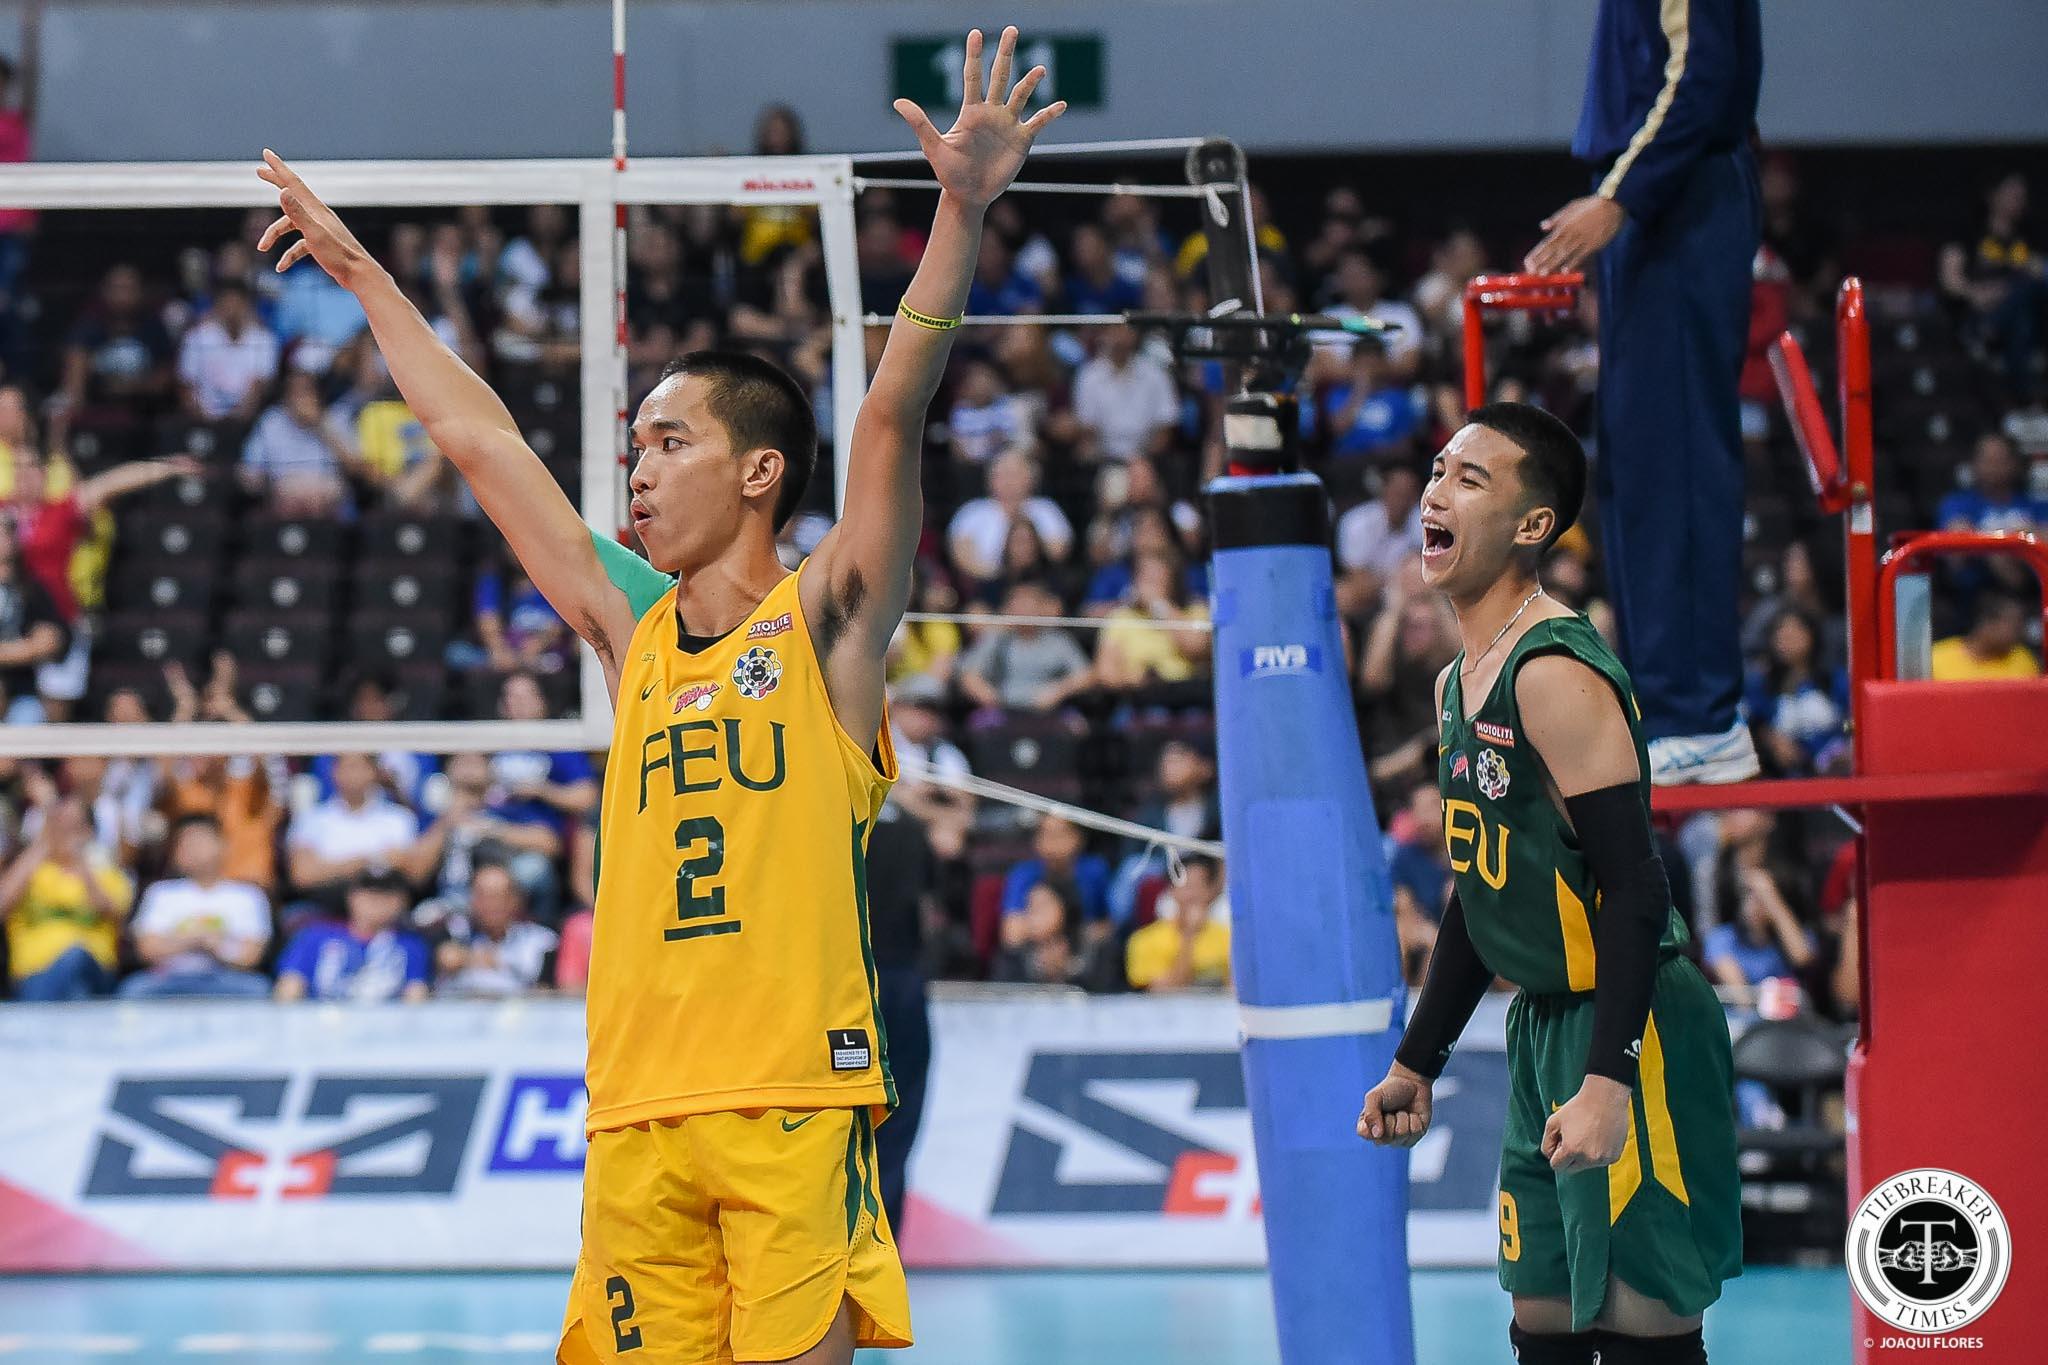 UAAP-81-Volleyball-FEU-vs.-ADMU-Solis-8299 FEU captain Richard Solis makes bold Season 82 prediction: 'Amin na 'yan' FEU News UAAP Volleyball  - philippine sports news